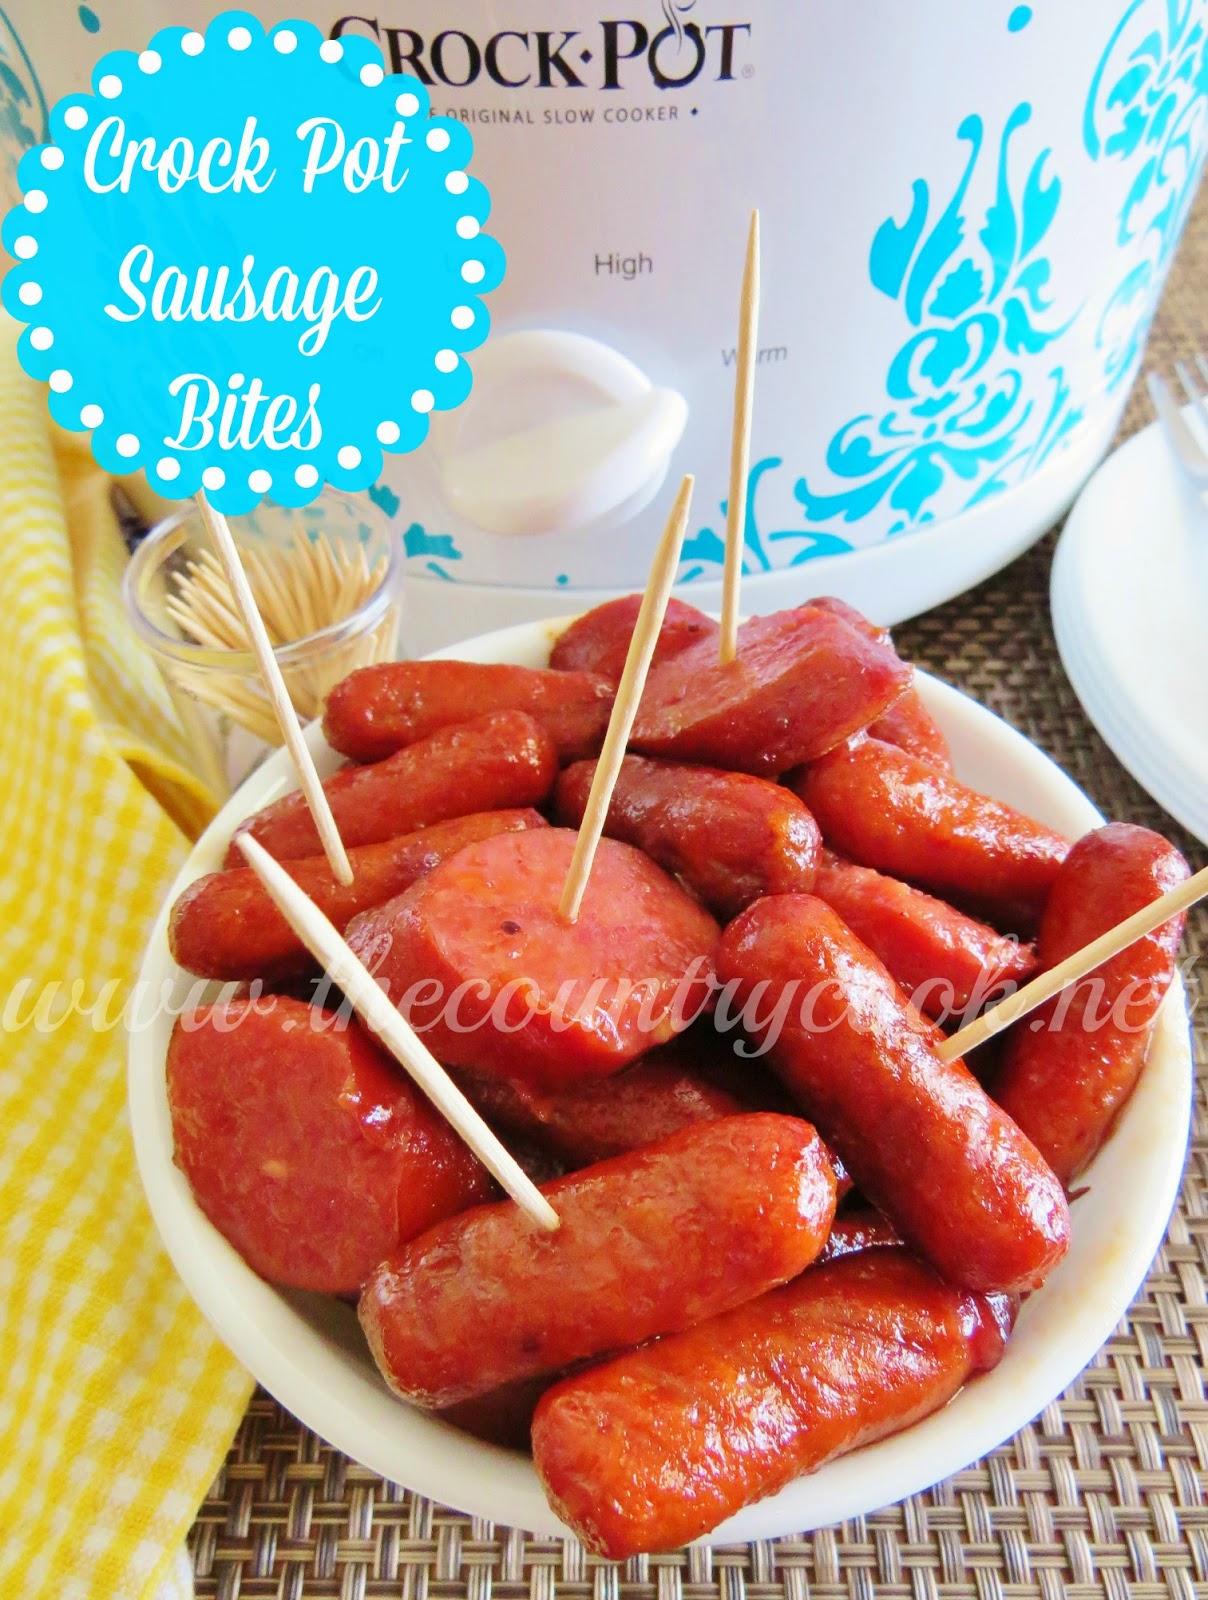 Eskort Limited - Life's Delicious :: Customer Care 0800 ... |Mini Sausage Bites